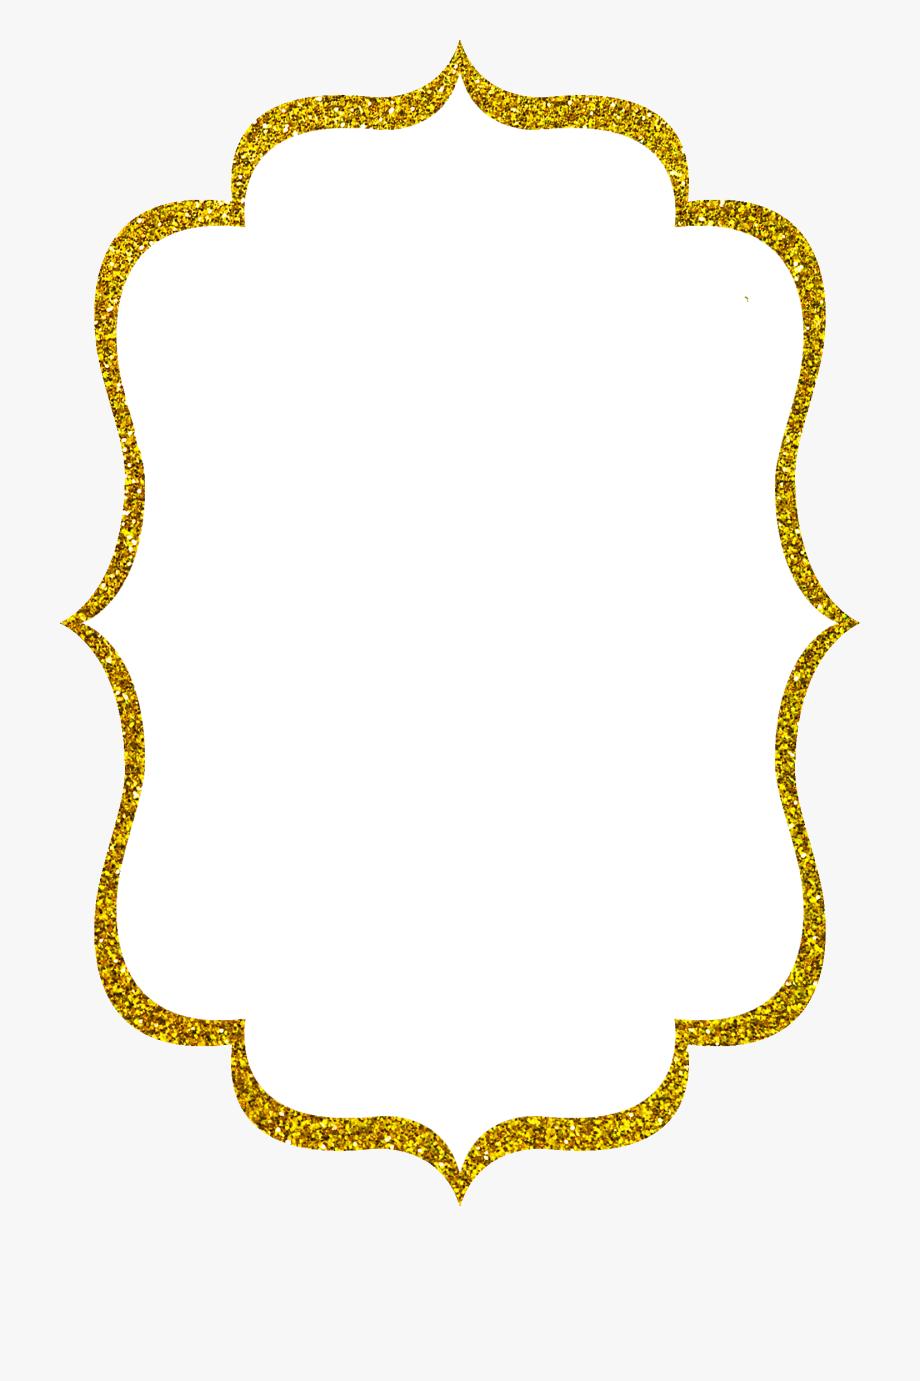 Clip Royalty Free Stock Gold Glitter Border Clipart.